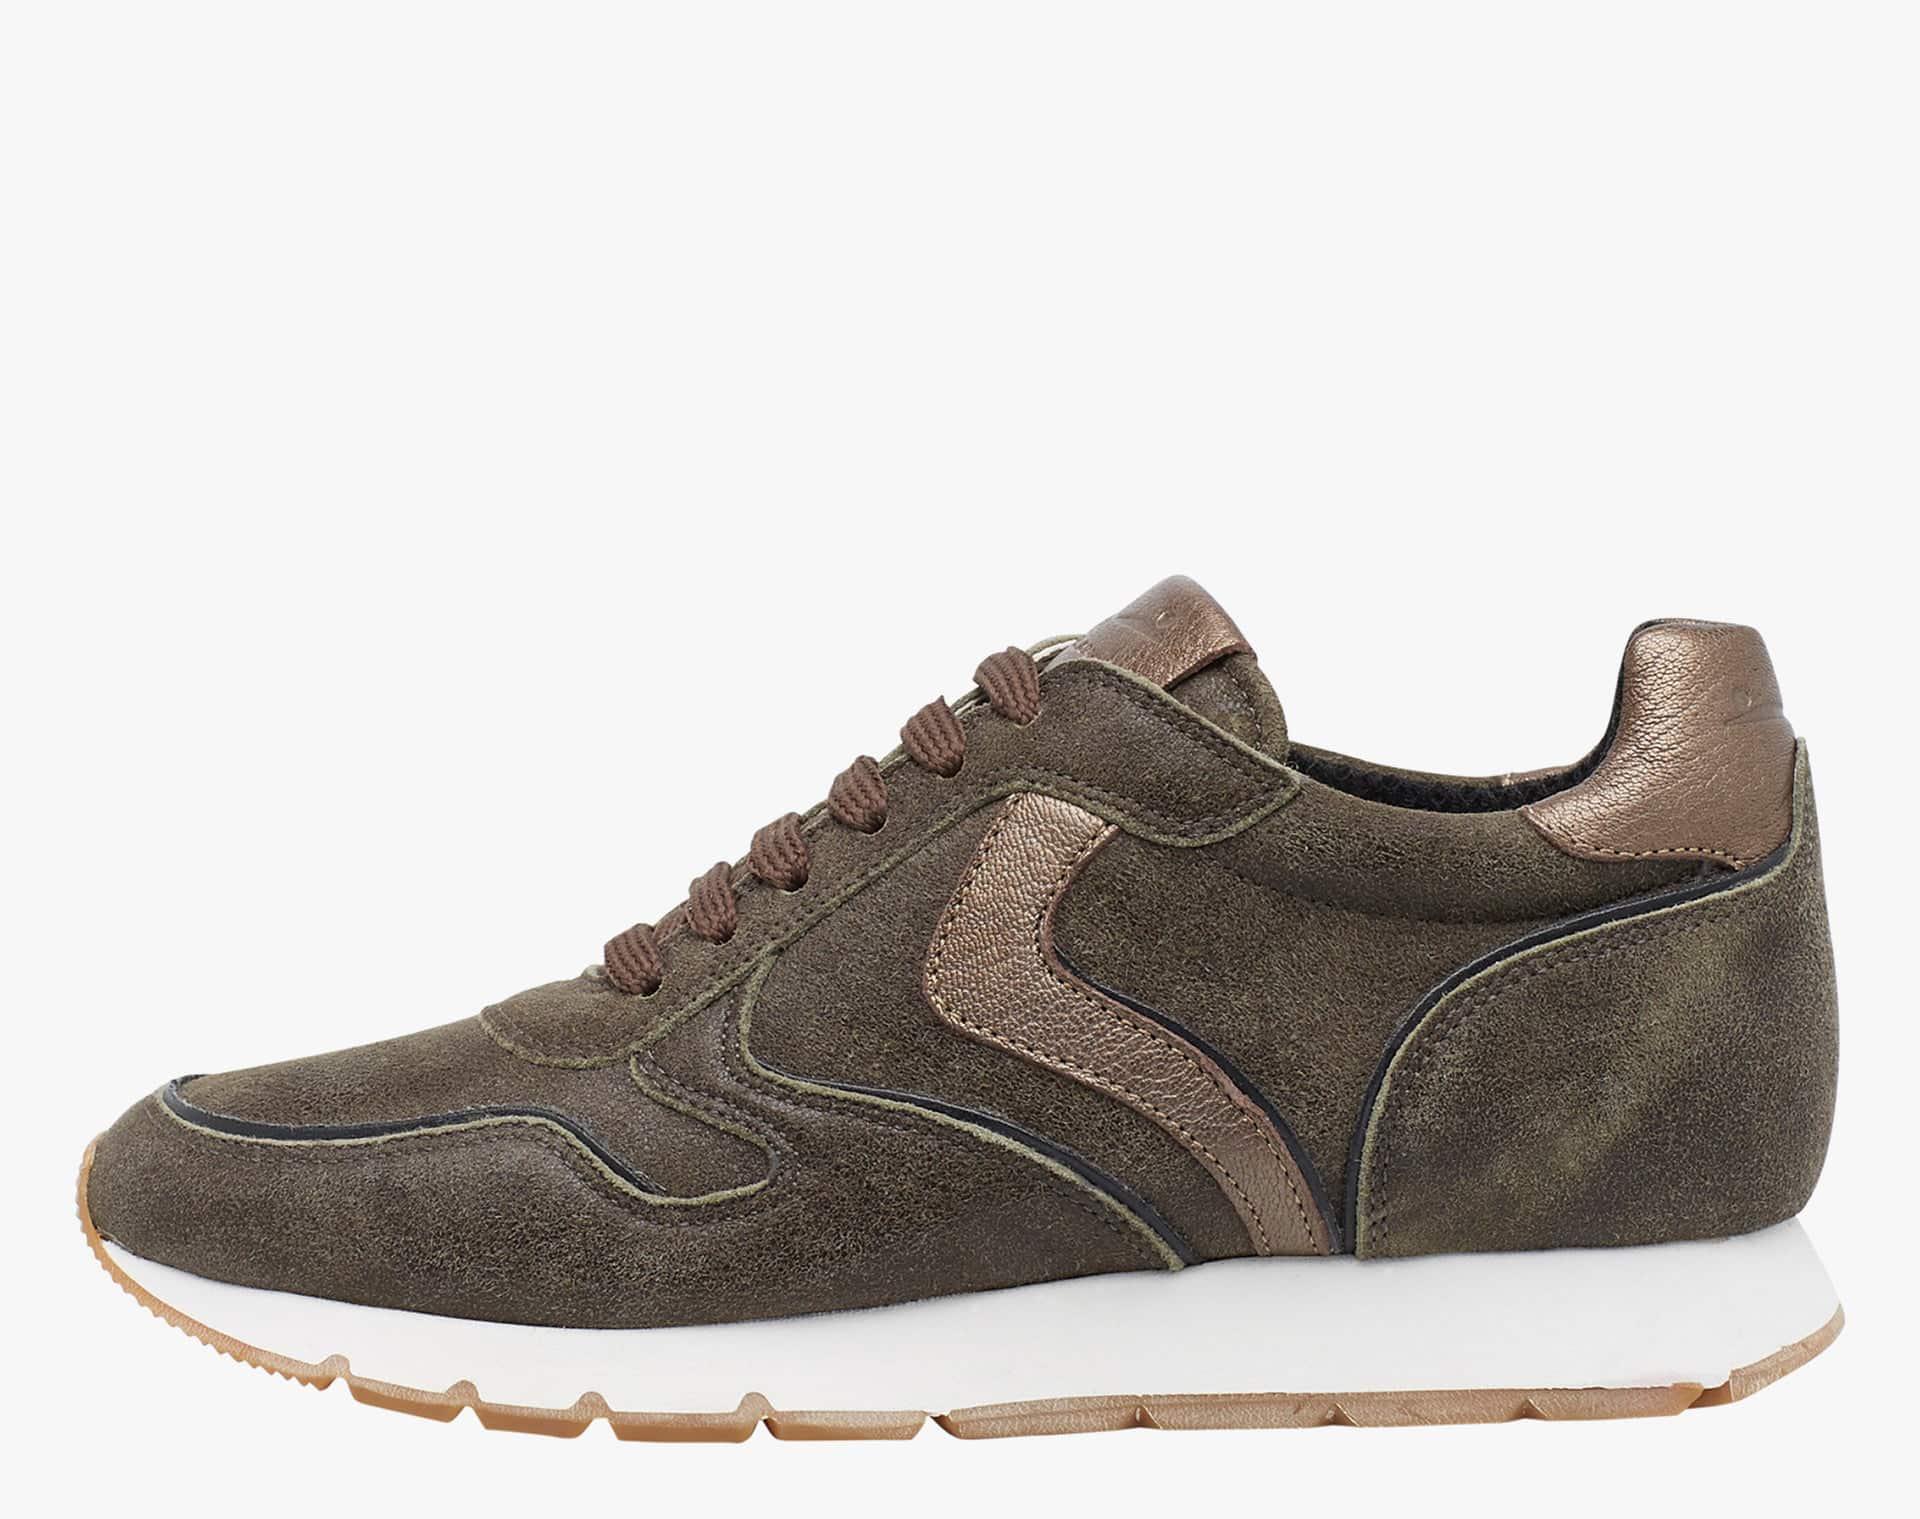 JULIA - Sneaker in pelle - Militare